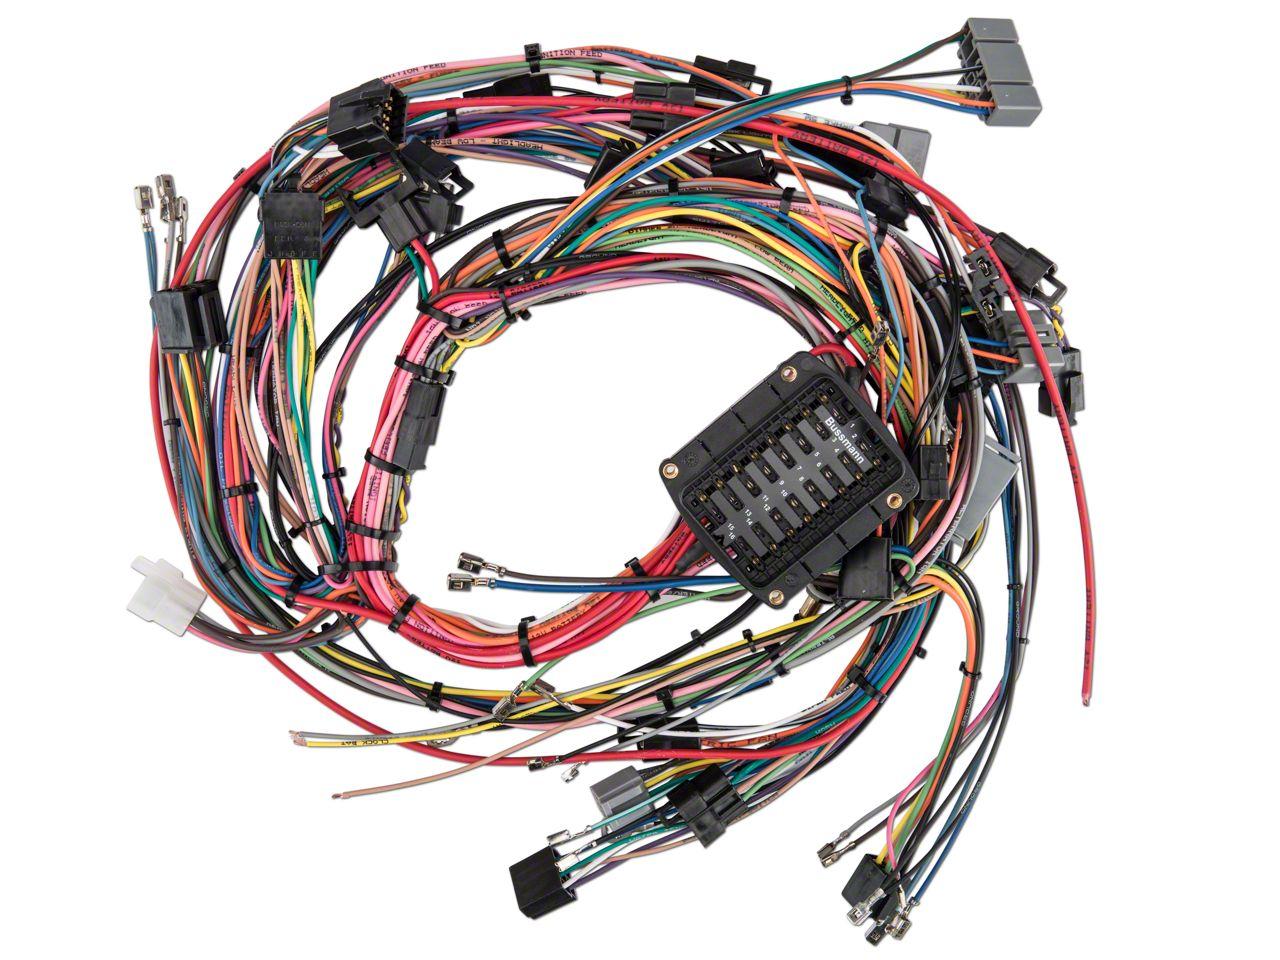 OPR Classic Update Wiring Kit (87-89 5.0L)